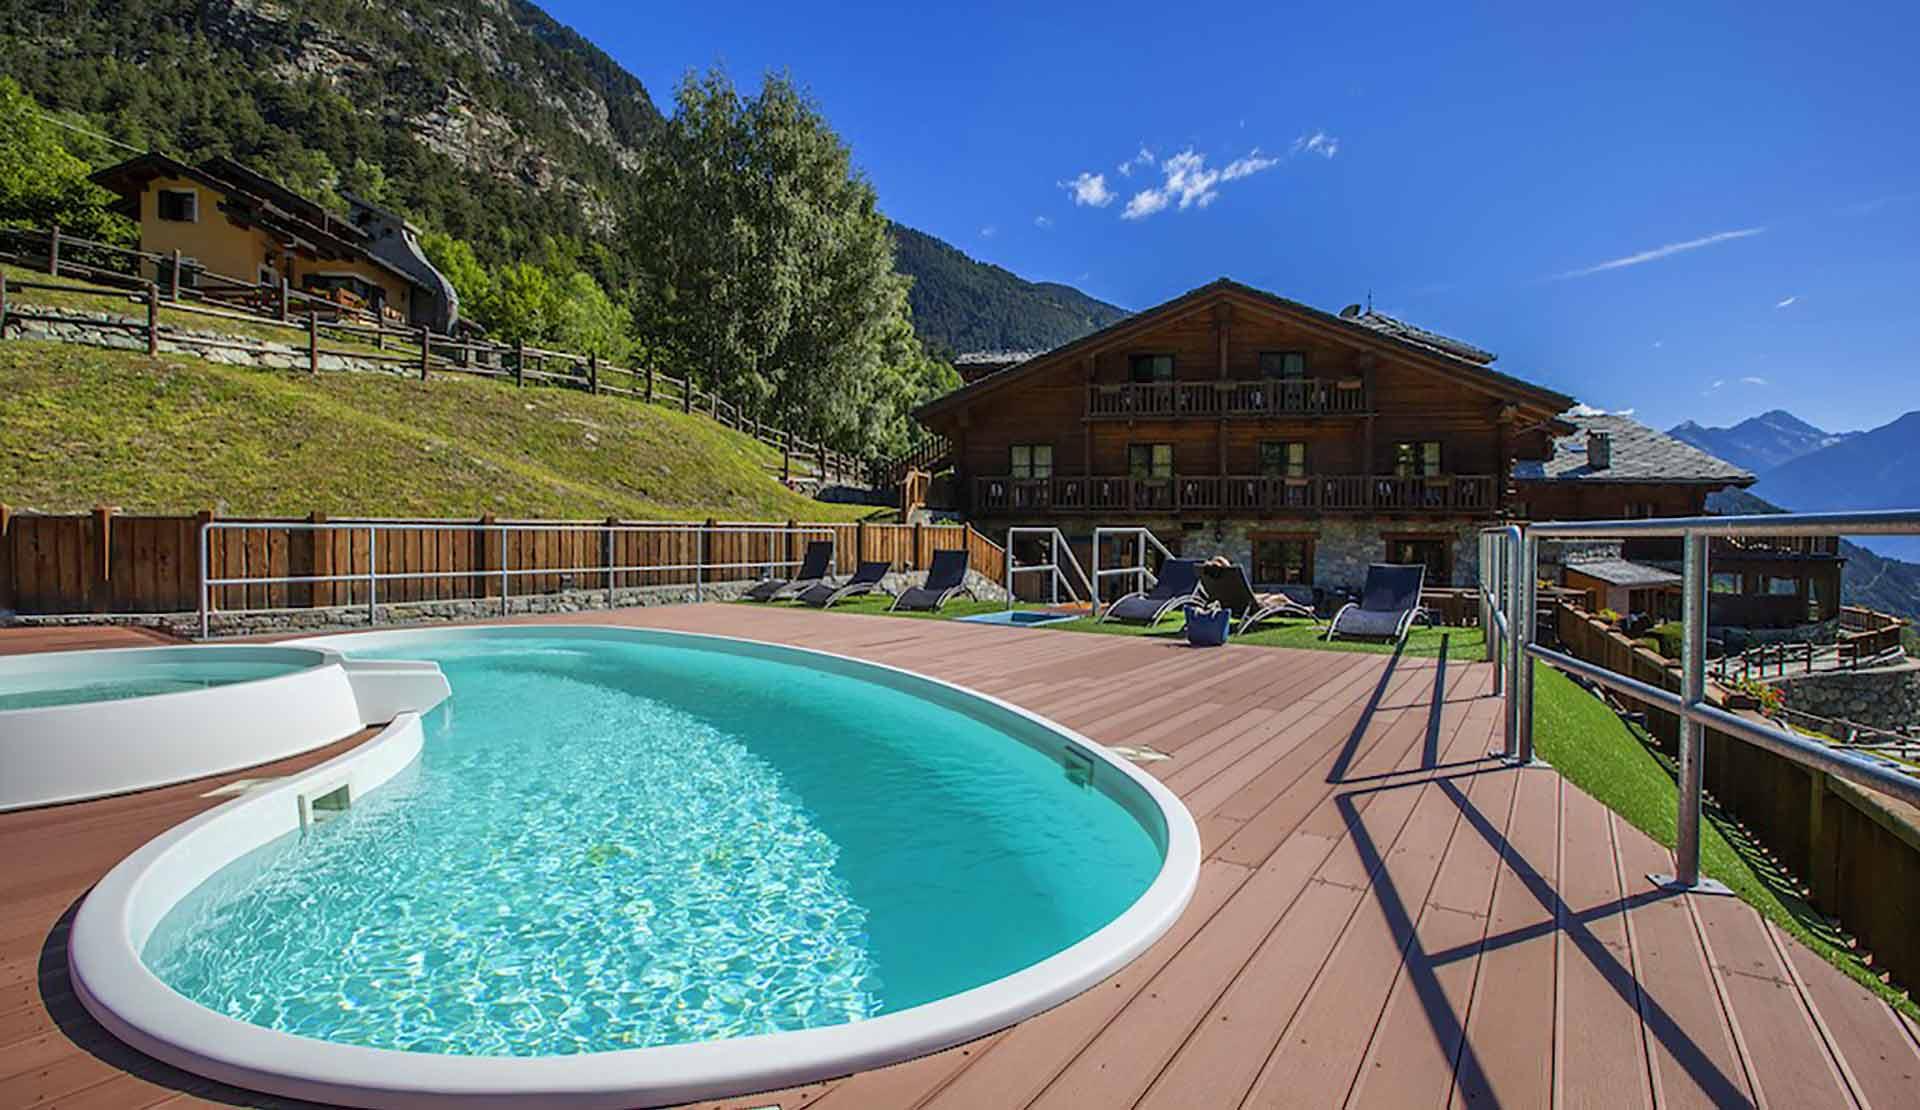 Piscina Hotel Mont avic